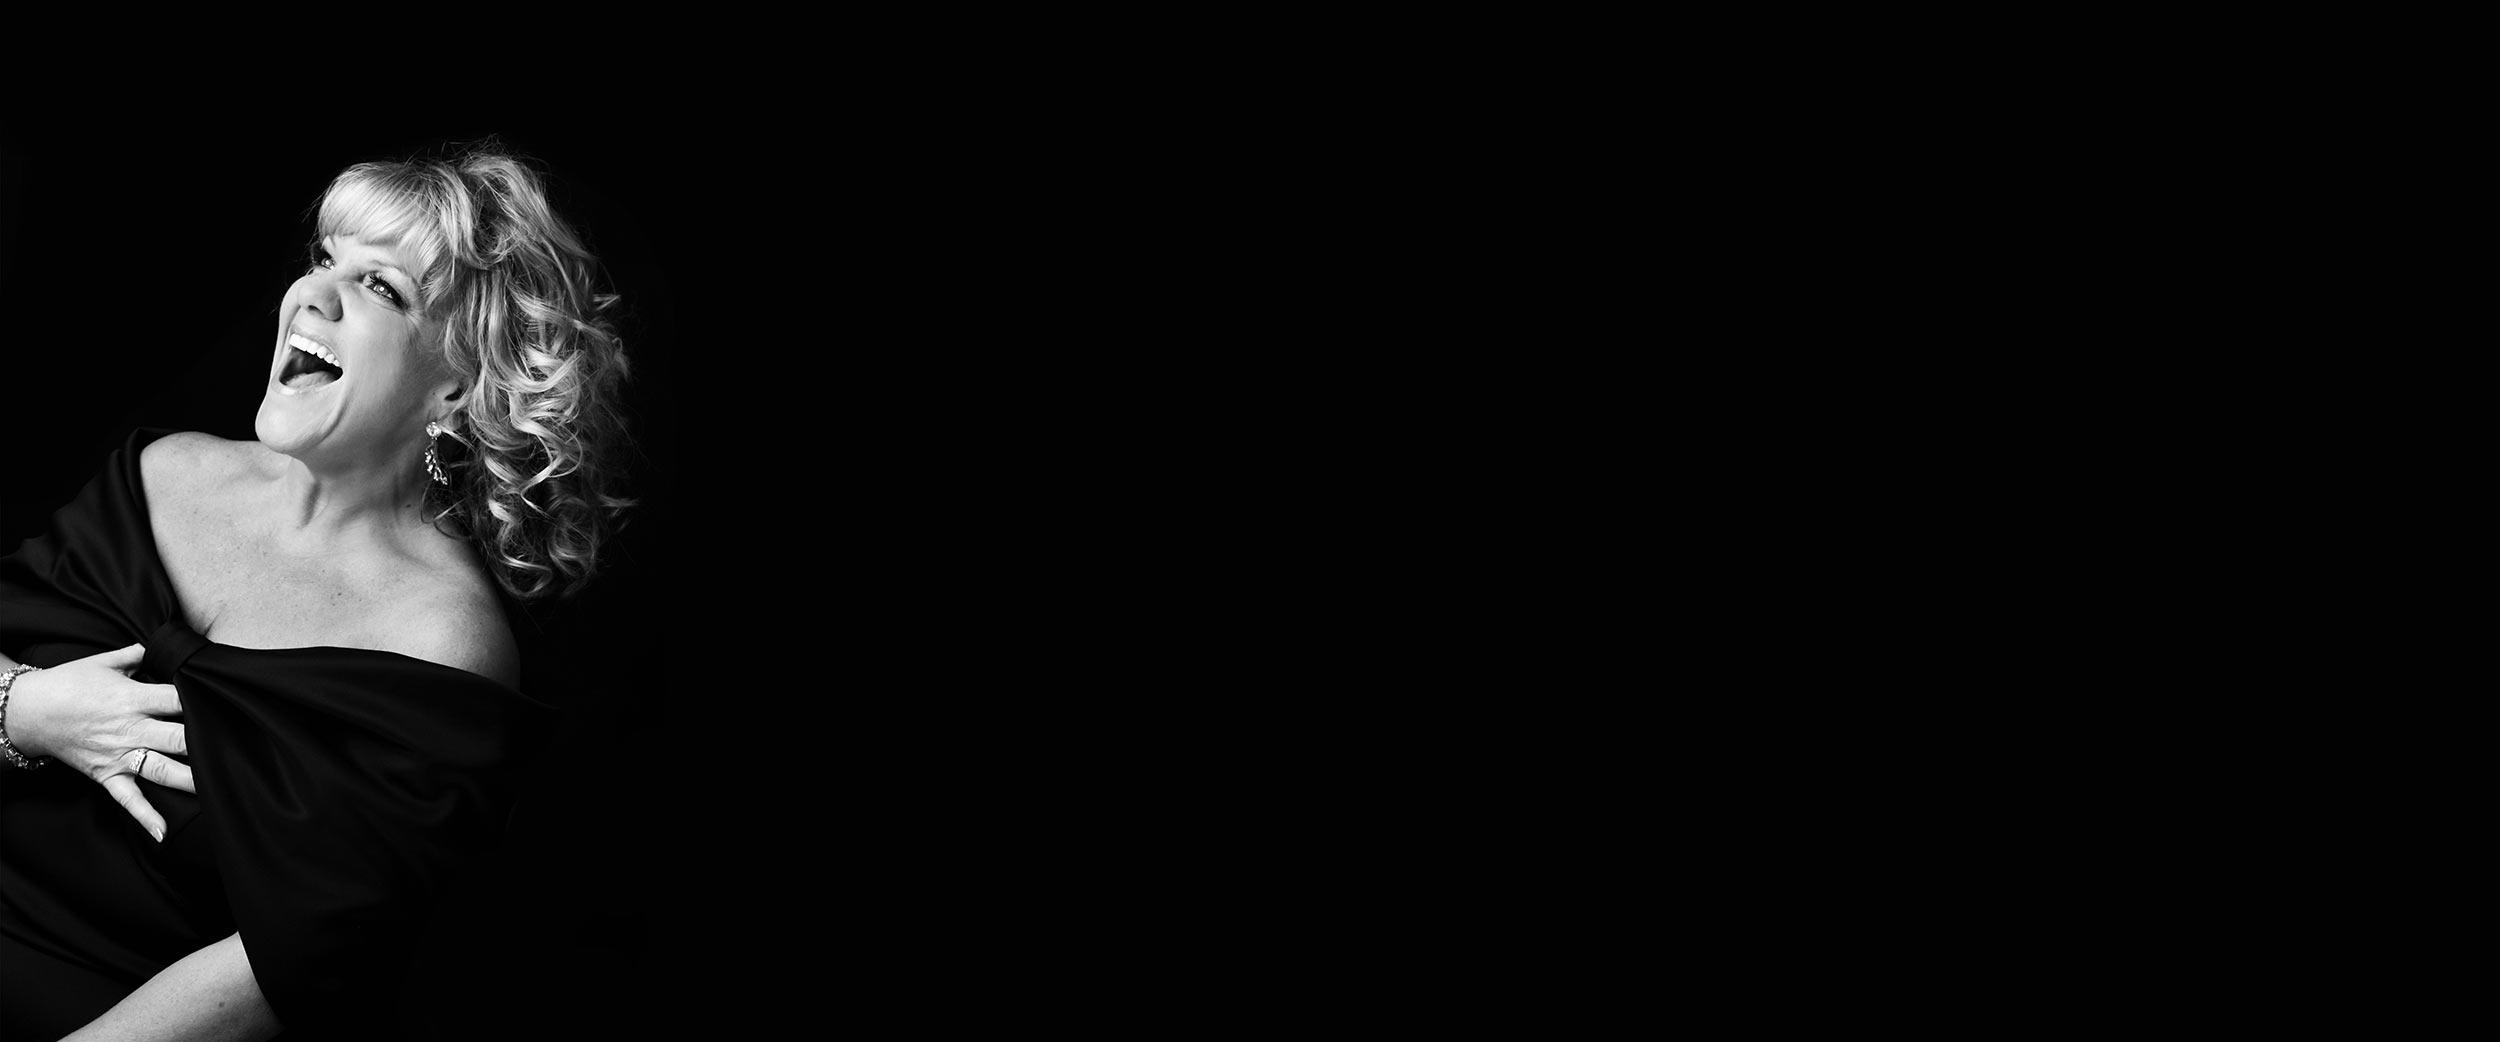 Ali-Retouched-2.jpg